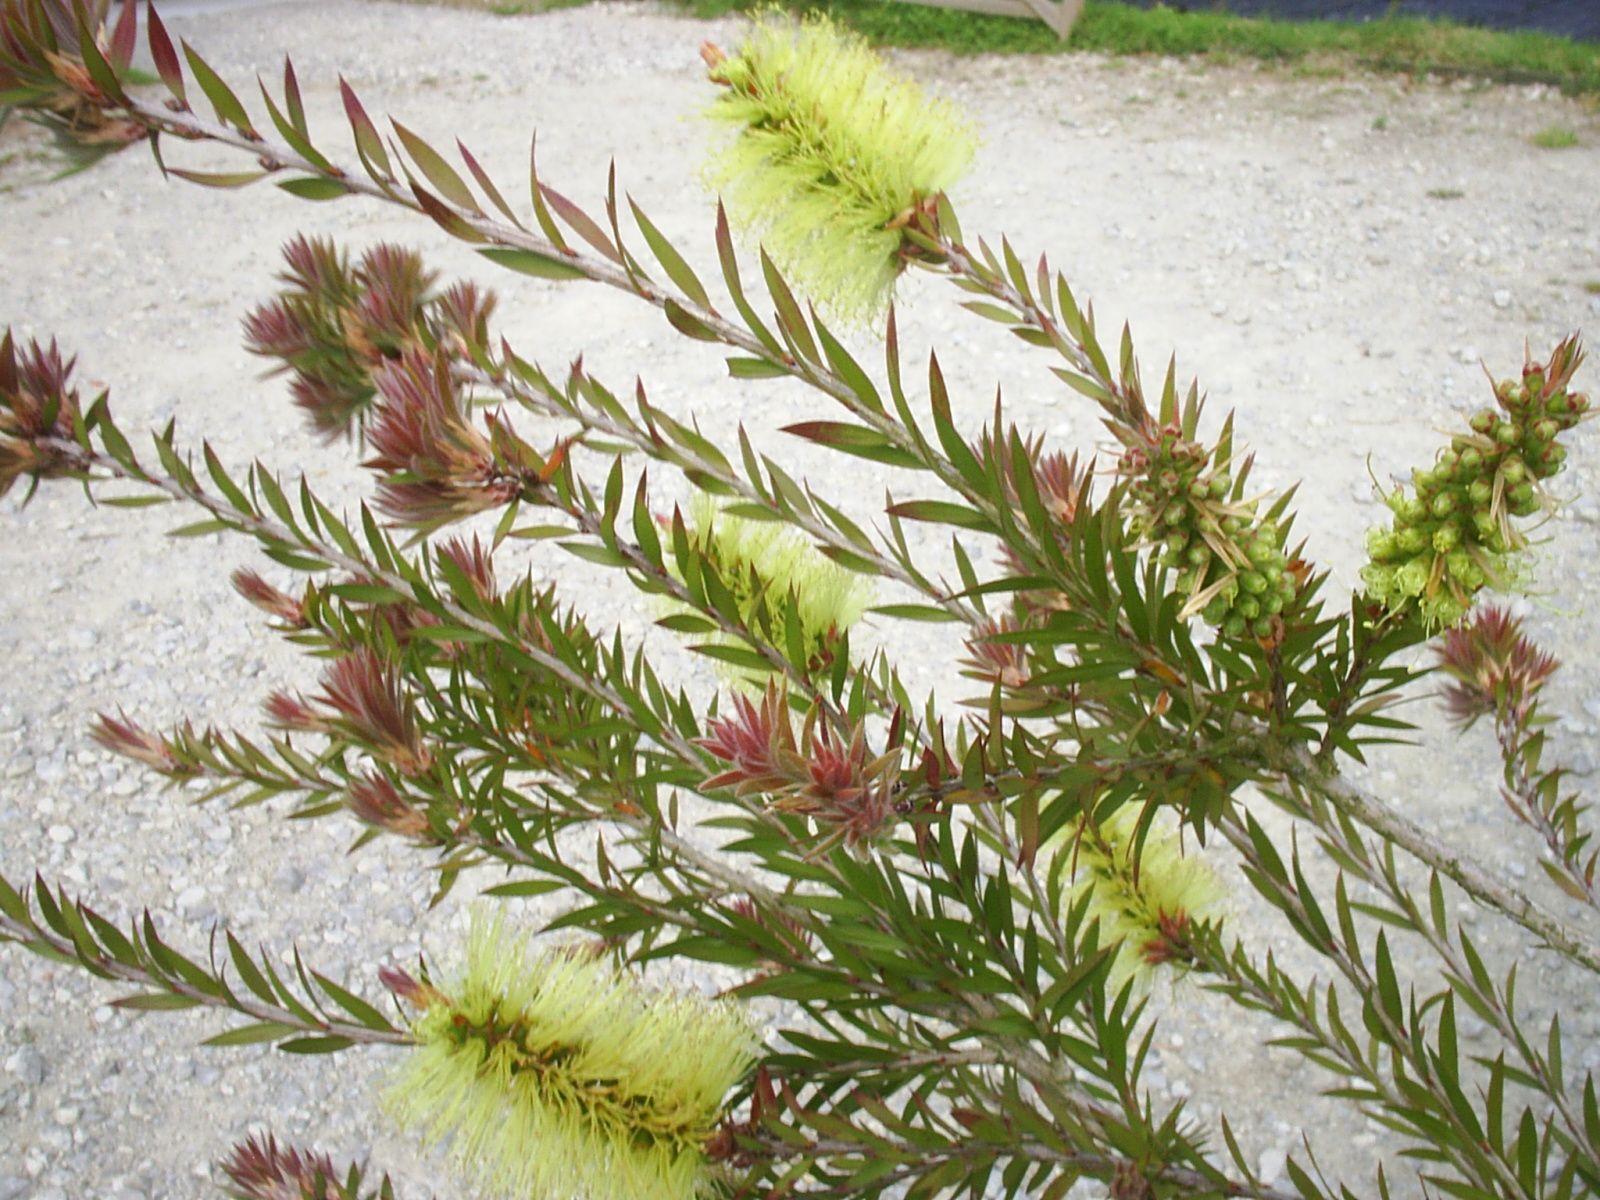 callistemon viridiflorus zn7b  5 u00ba to 10 u00baf  myrtaceae in tasmania where it is native it follows